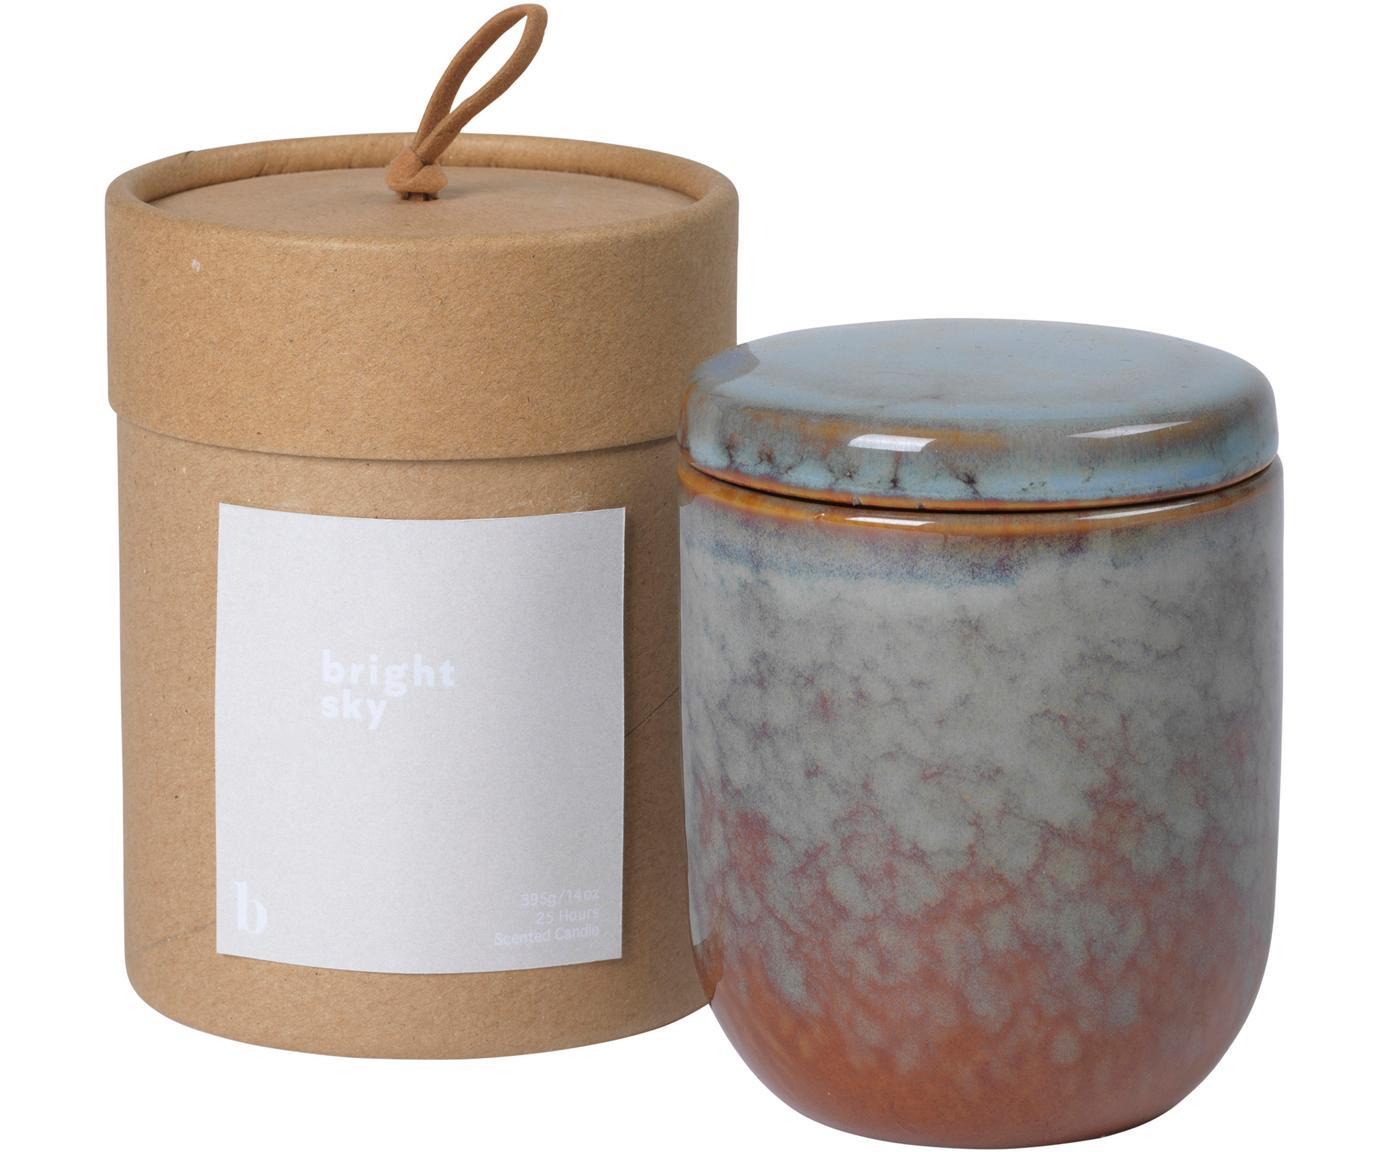 Duftkerze Bright Sky, Behälter: Keramik, Braun, Blau, Ø 8 x H 9 cm